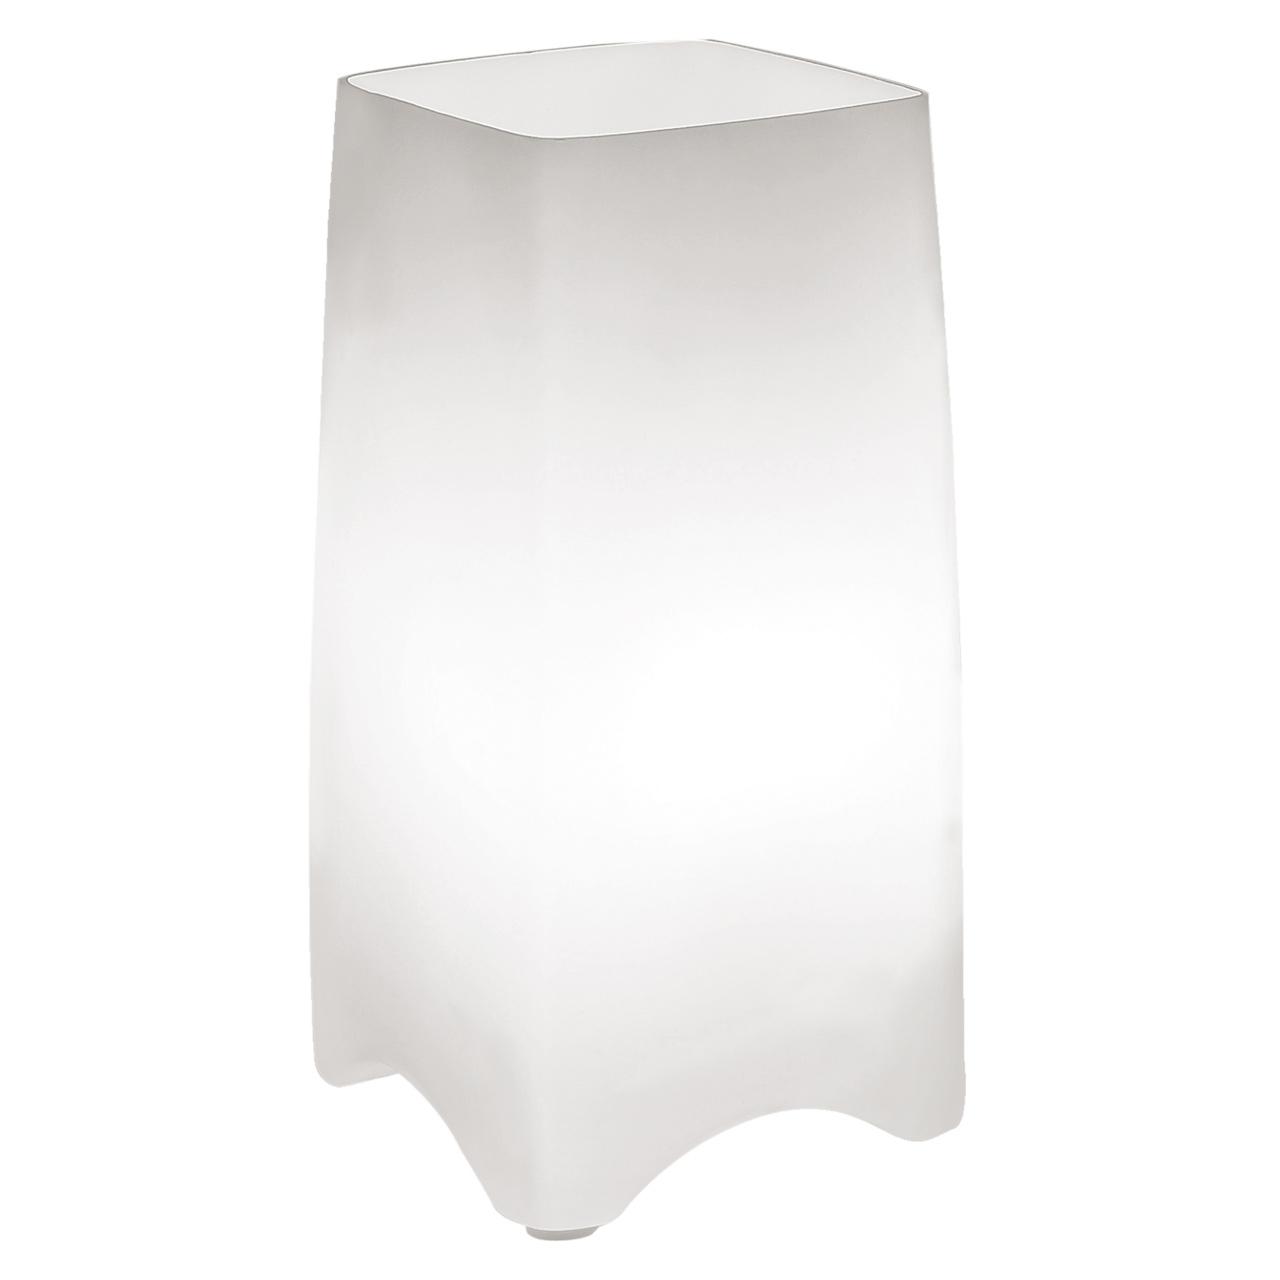 Настольная лампа Meringe 1х40W E27 белый Lightstar 801920